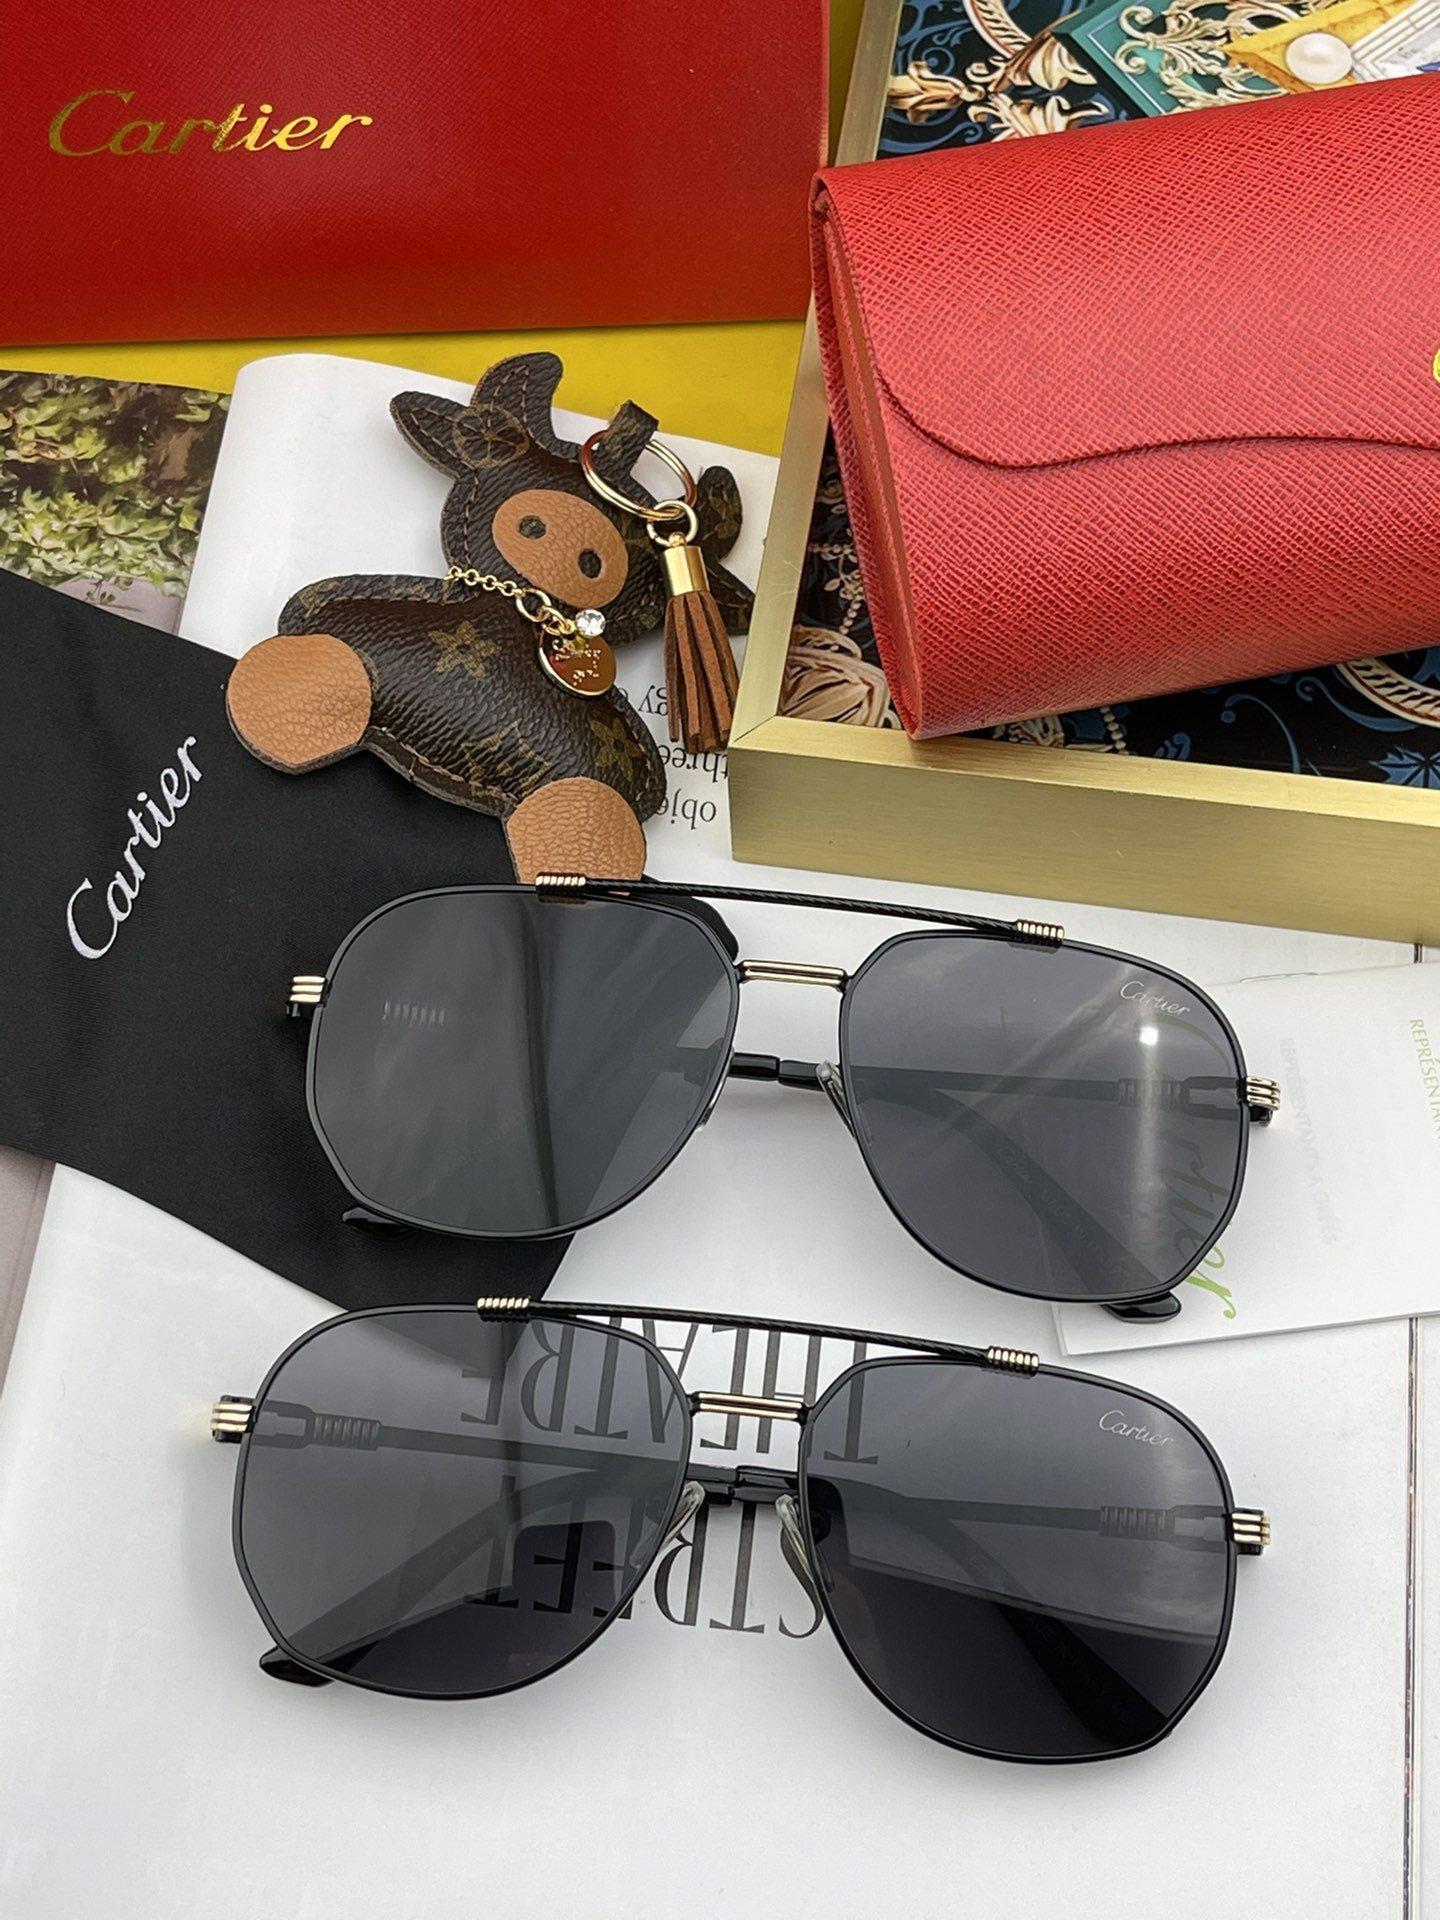 Cartie*卡地亚墨镜男士太阳眼镜